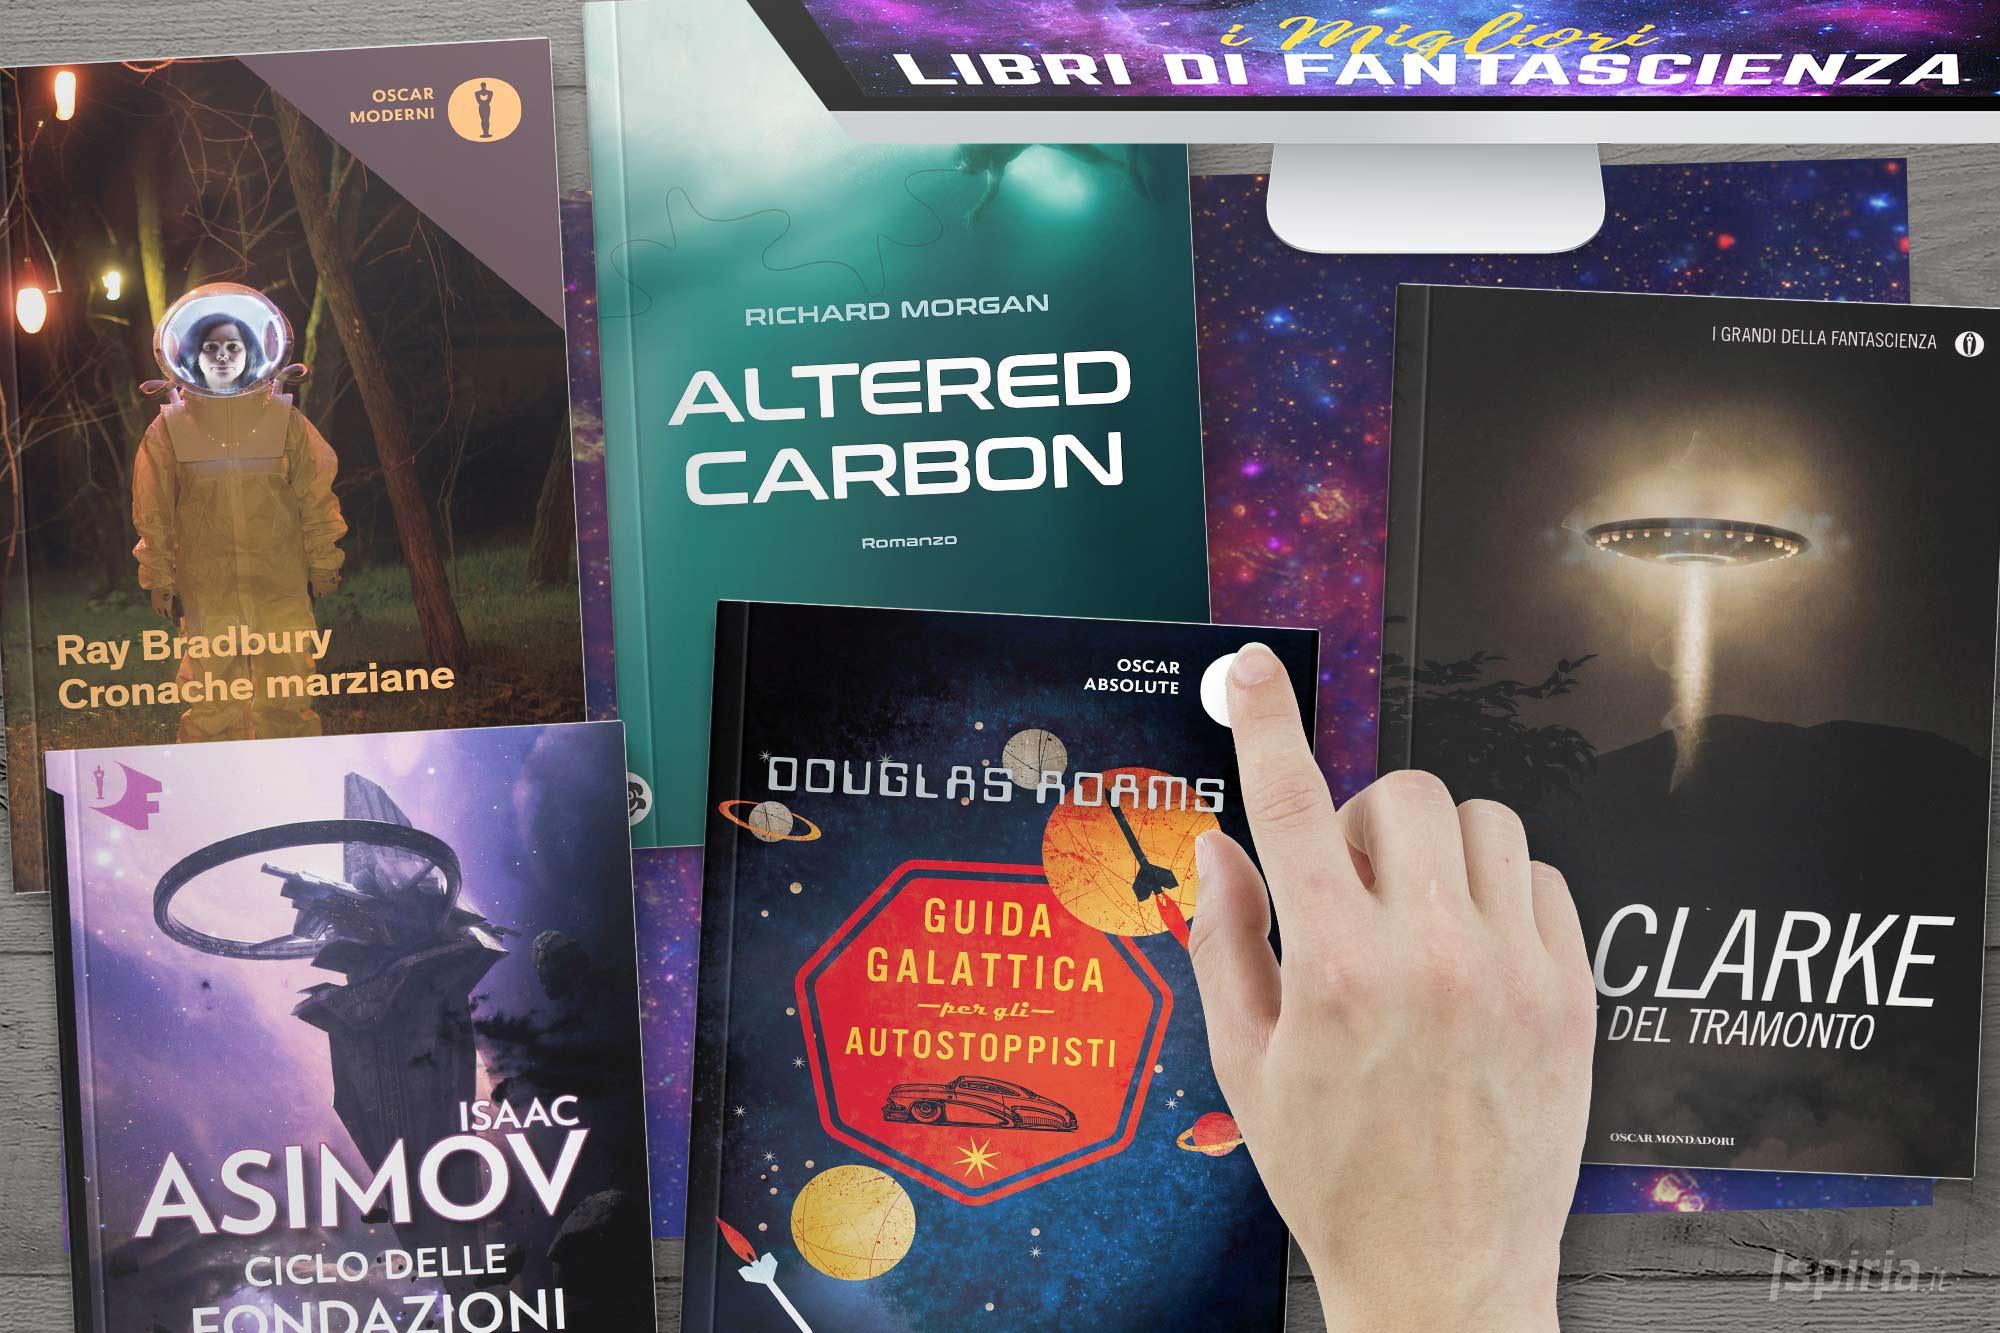 Migliori Libri Fantascienza Da Leggere | Romanzi Fantascientifici Sci-fi Spazio